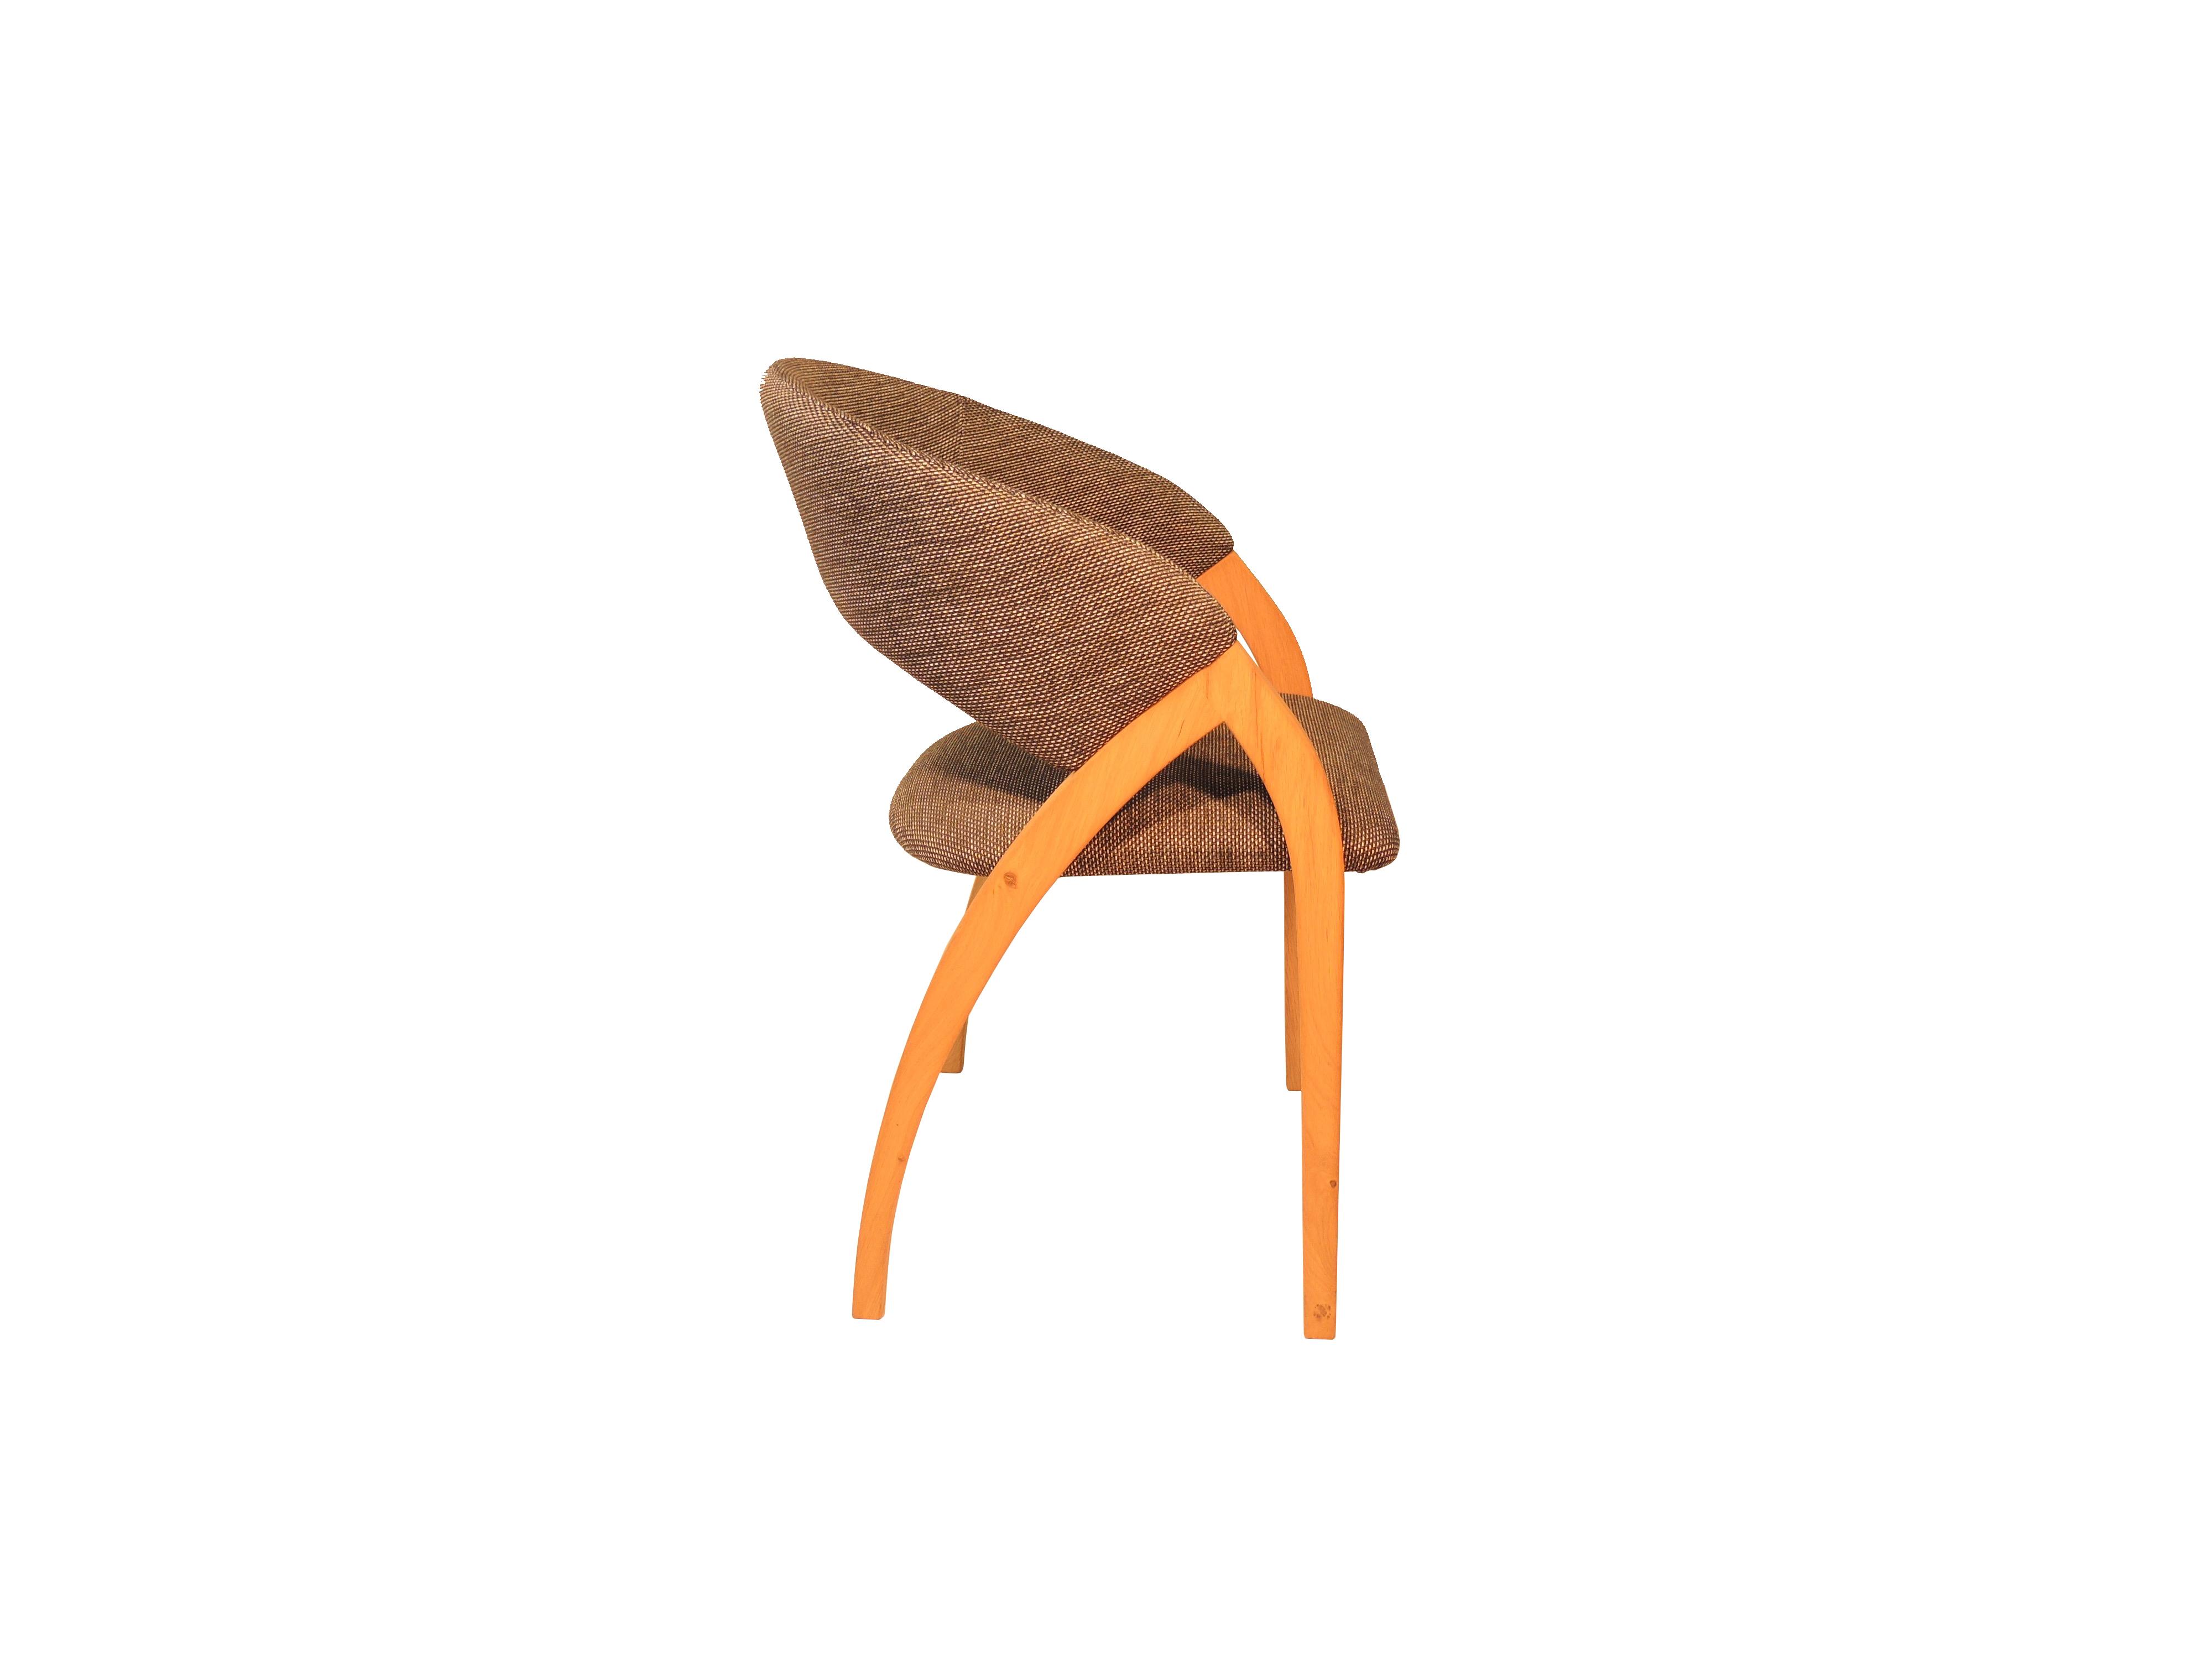 Arturo - Eigen design